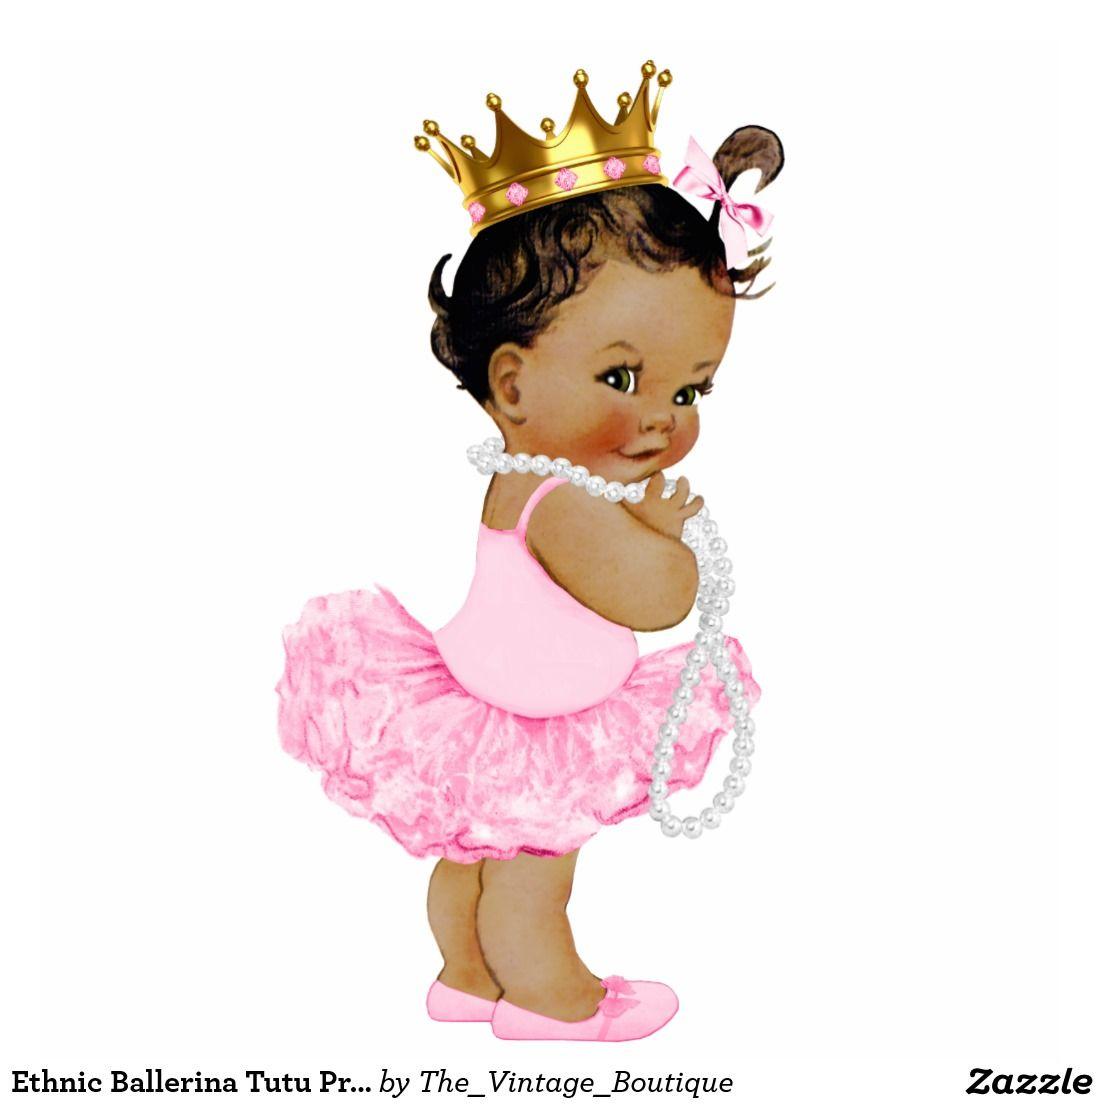 Ballerina clipart baby shower. Ethnic tutu princess girl